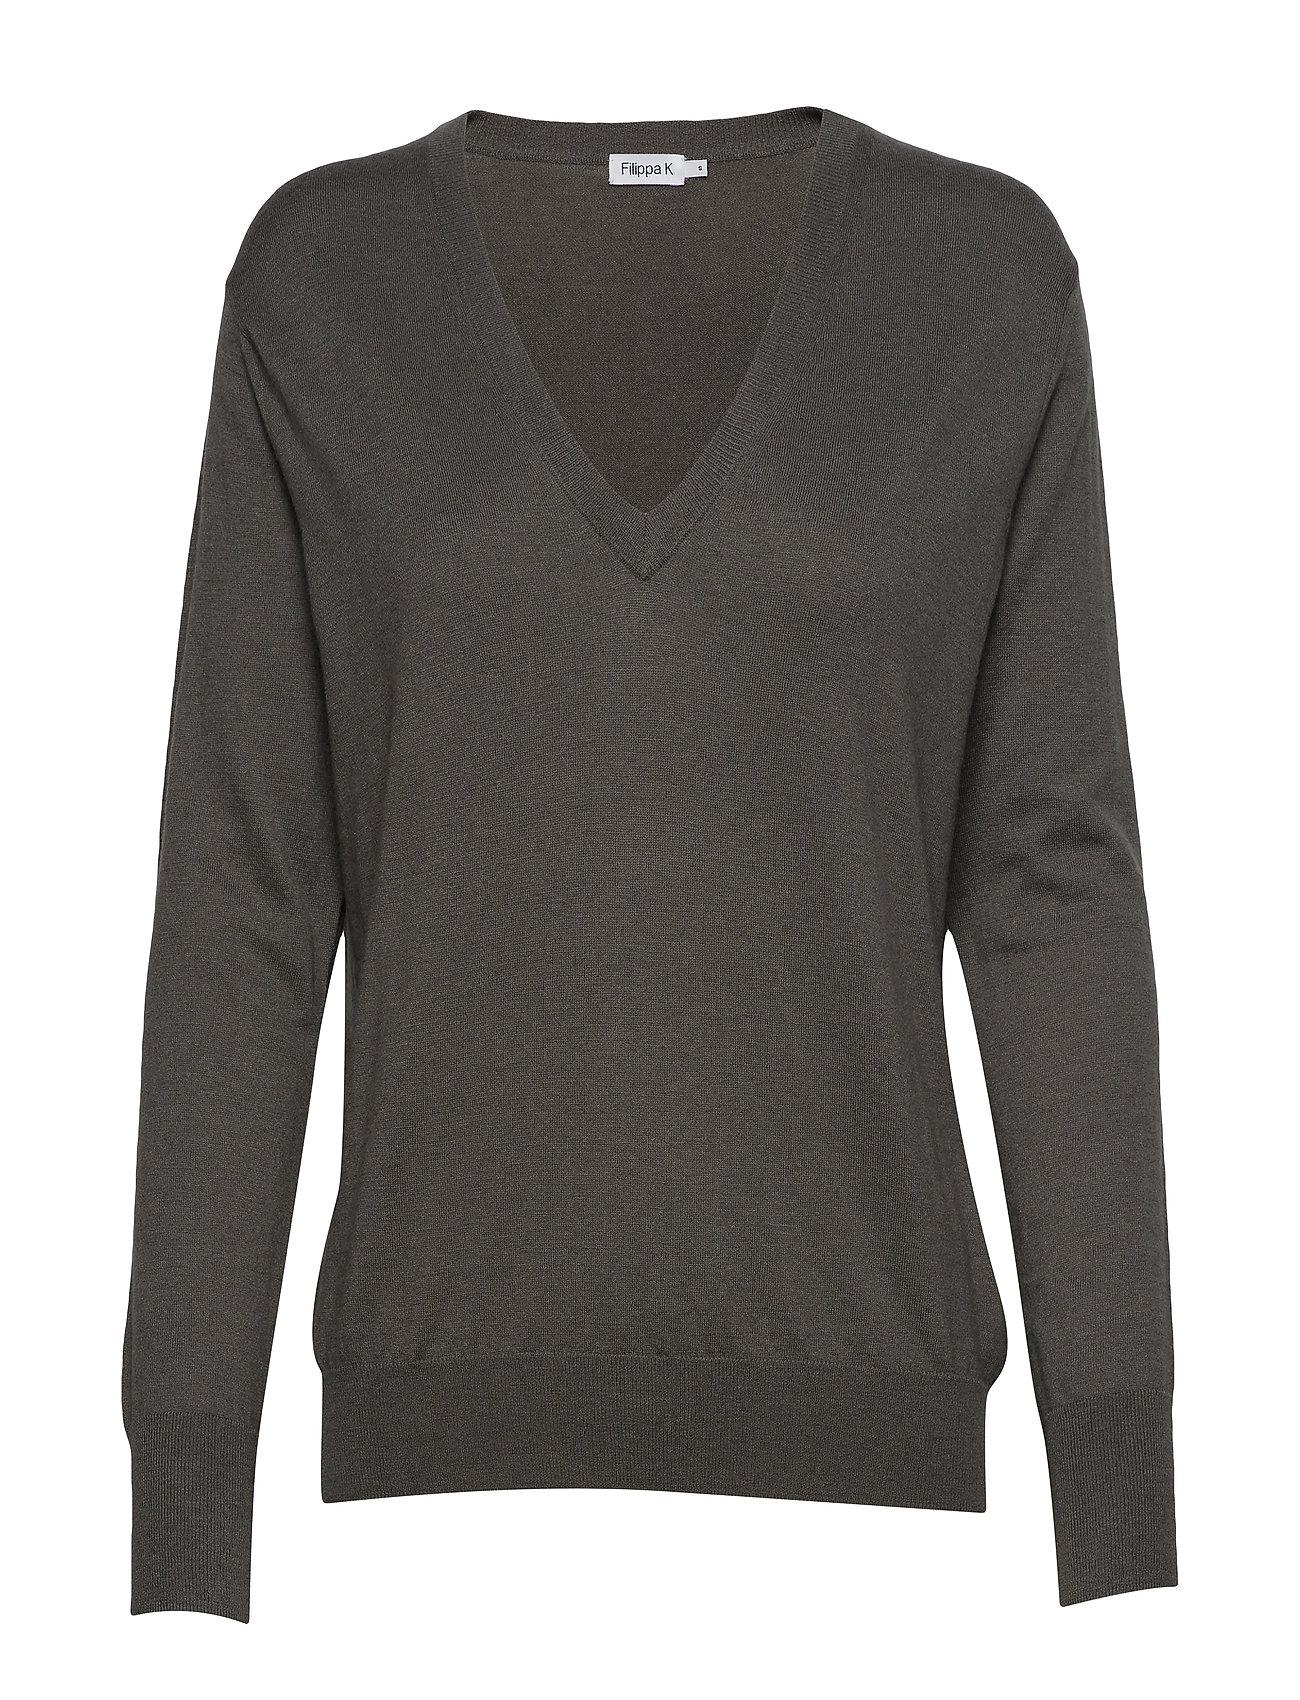 Filippa K Silk Mix V-Neck Sweater - MINERAL GR